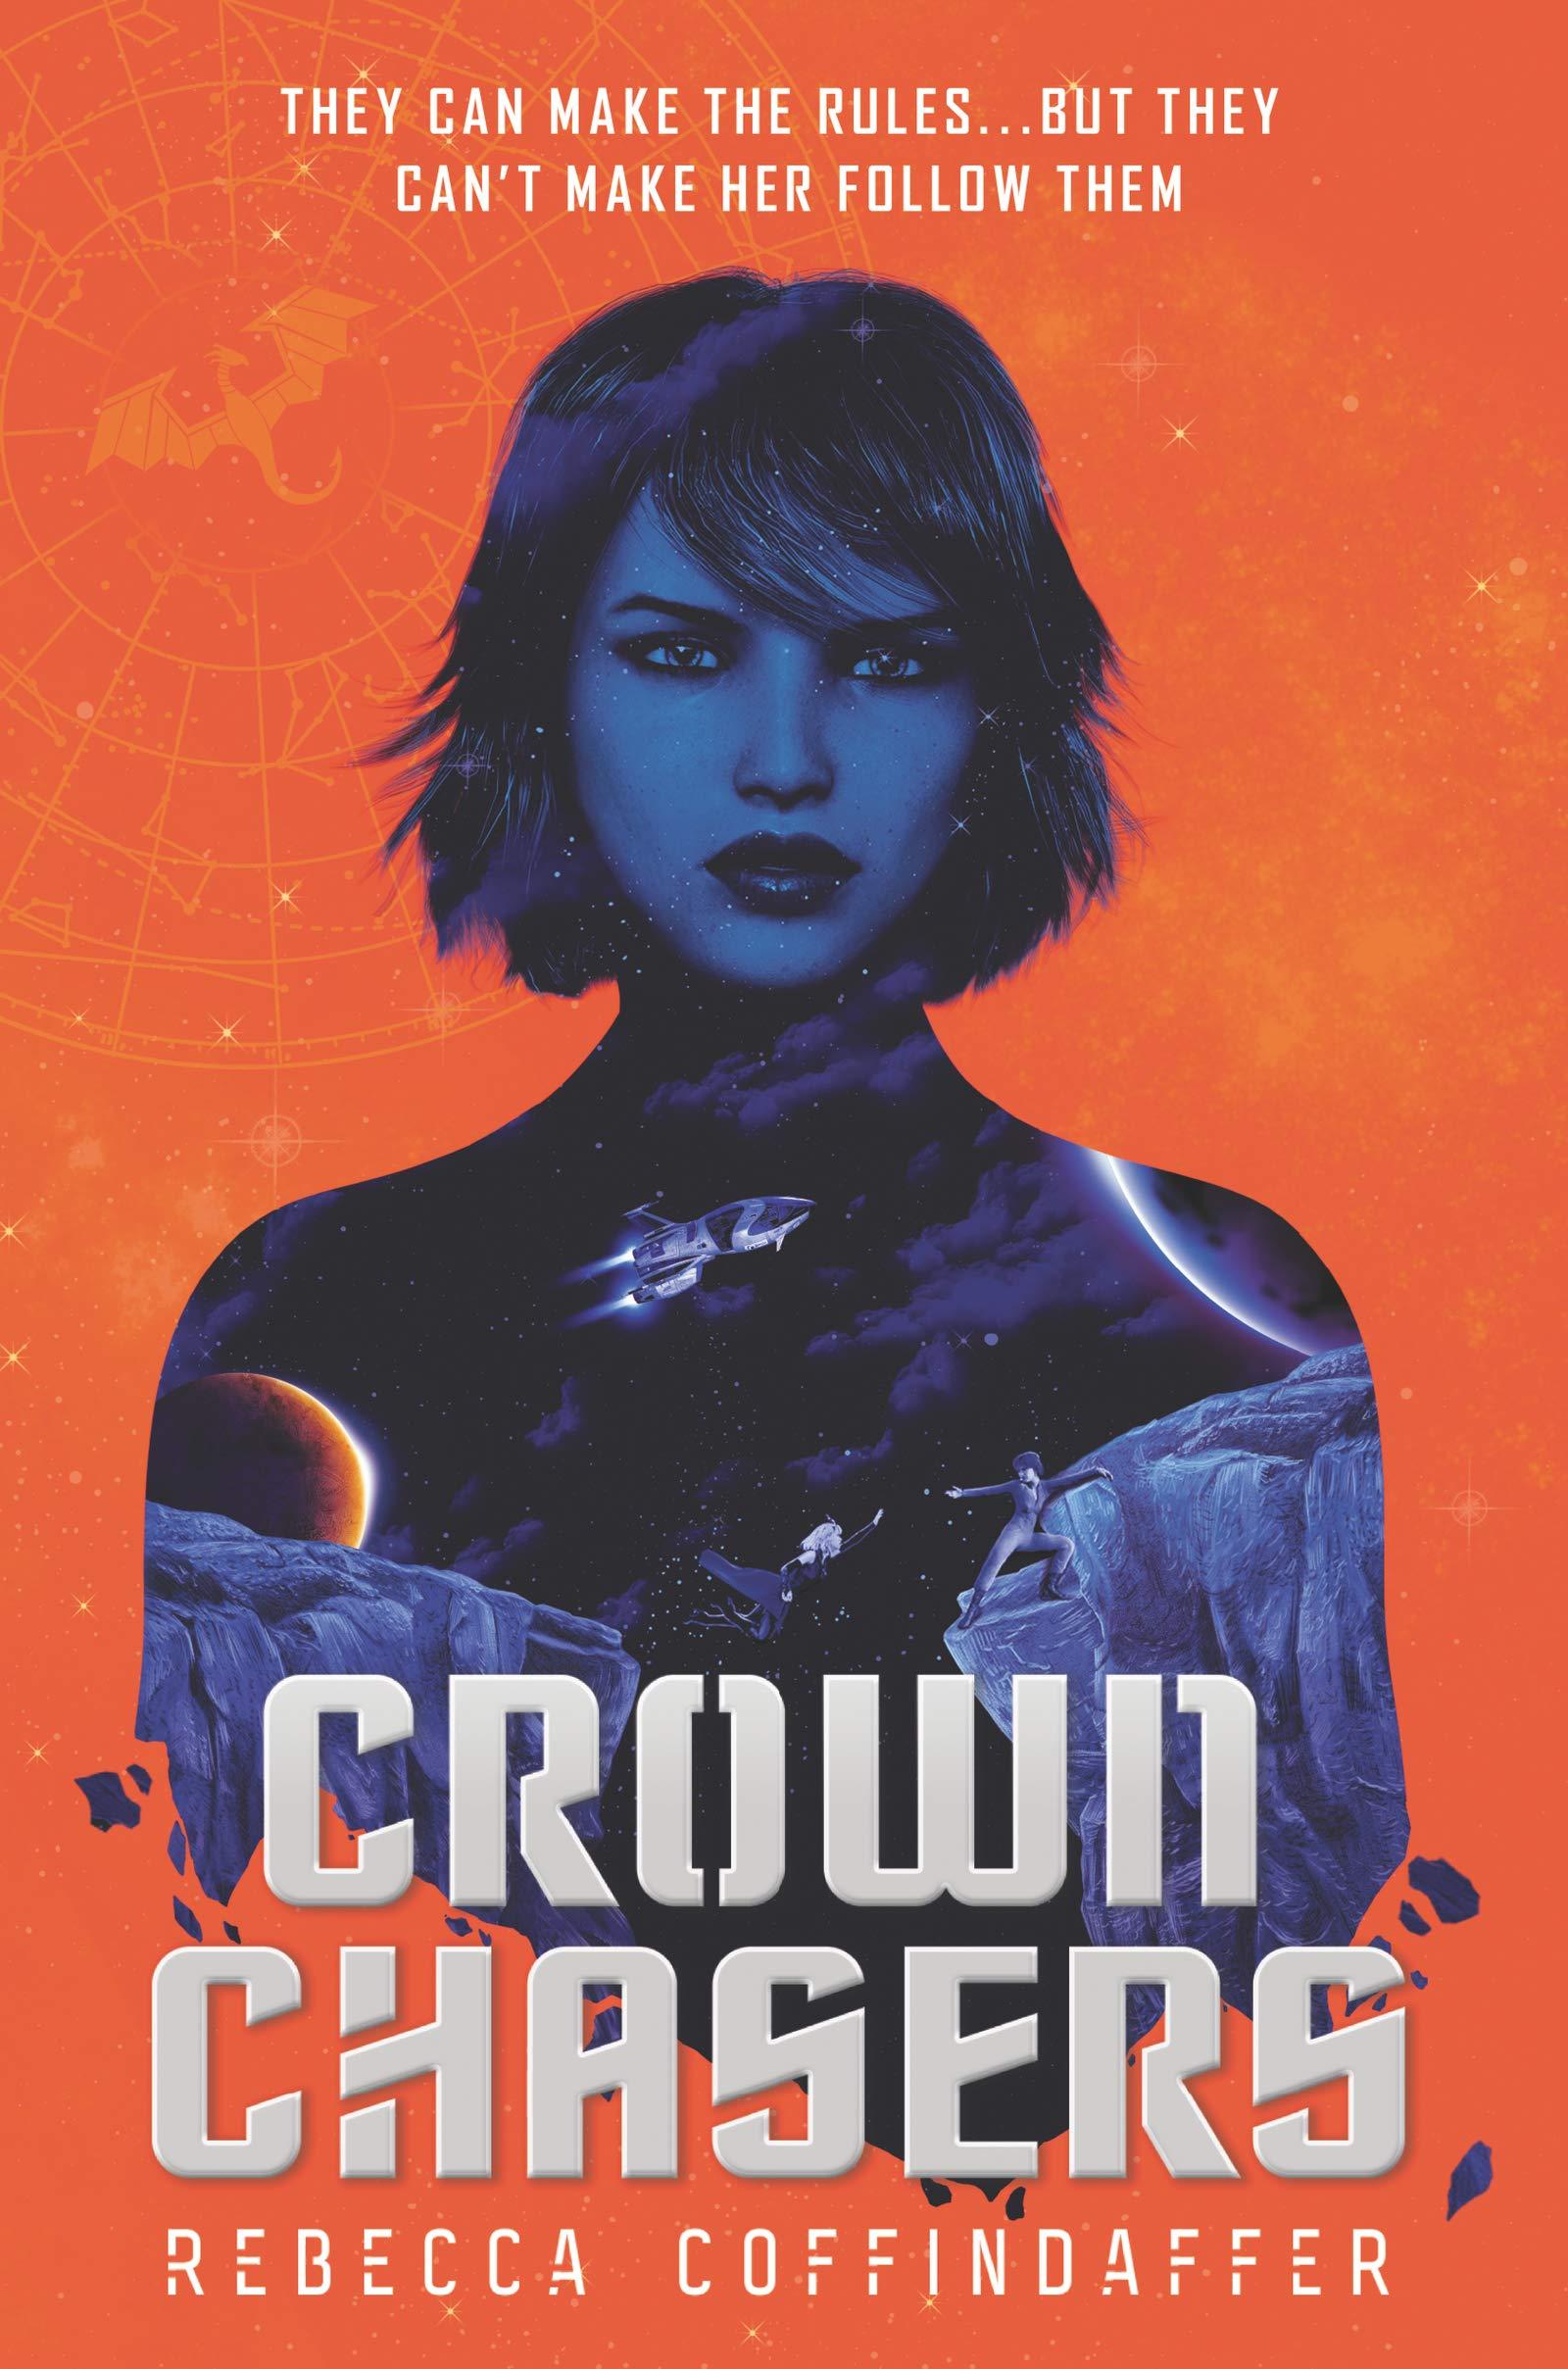 Amazon.com: Crownchasers (9780062845160): Coffindaffer, Rebecca: Books